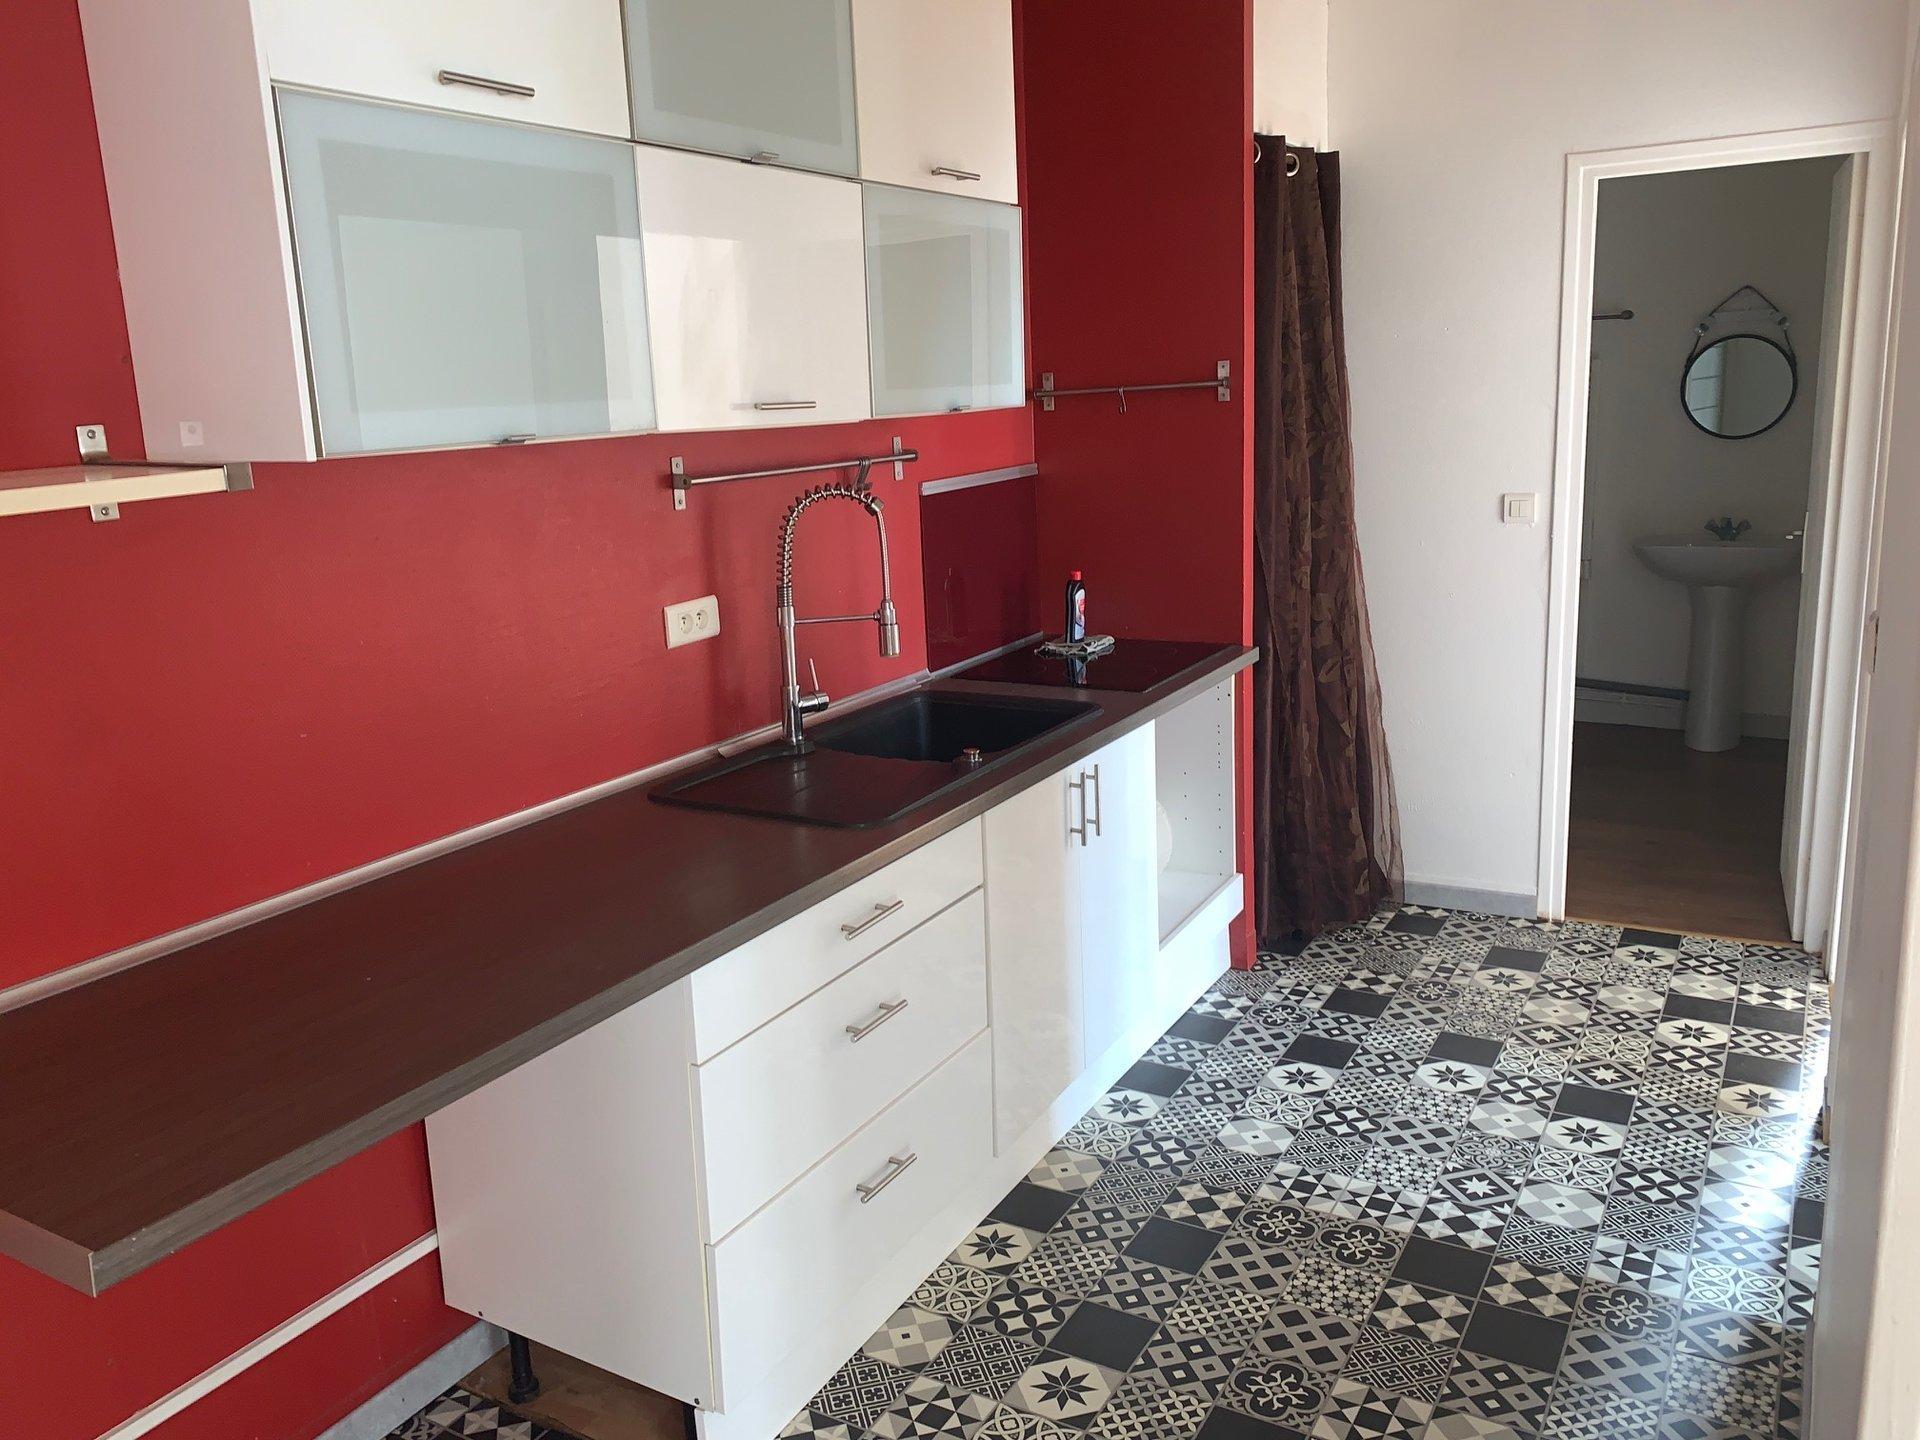 T3 Appartement RDC